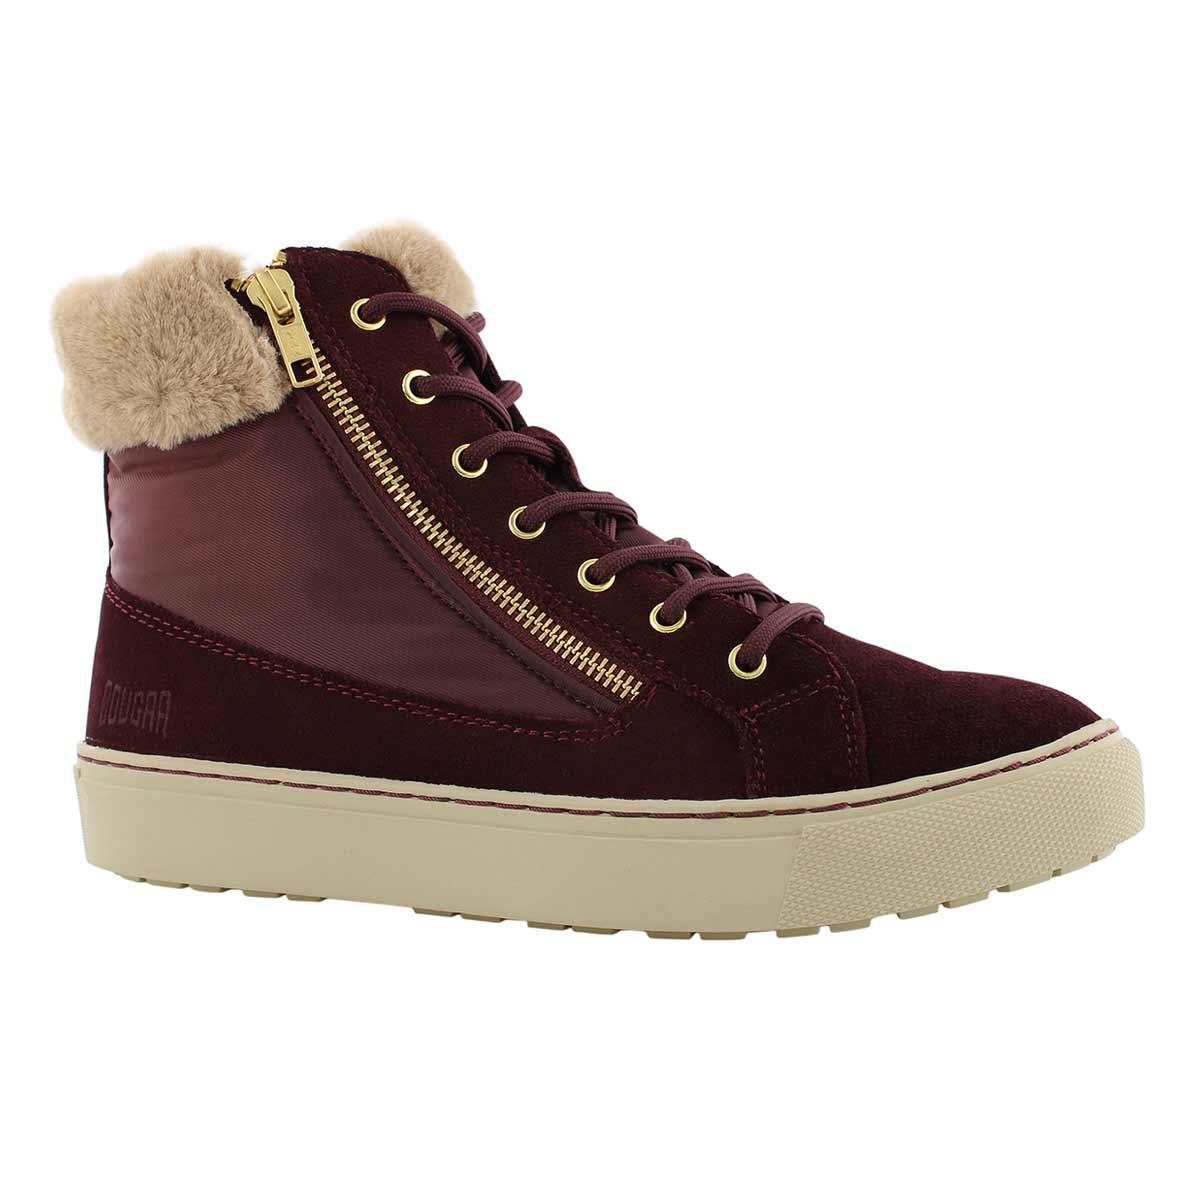 Lds Dublin wne wtpf lace/zip wntr boot